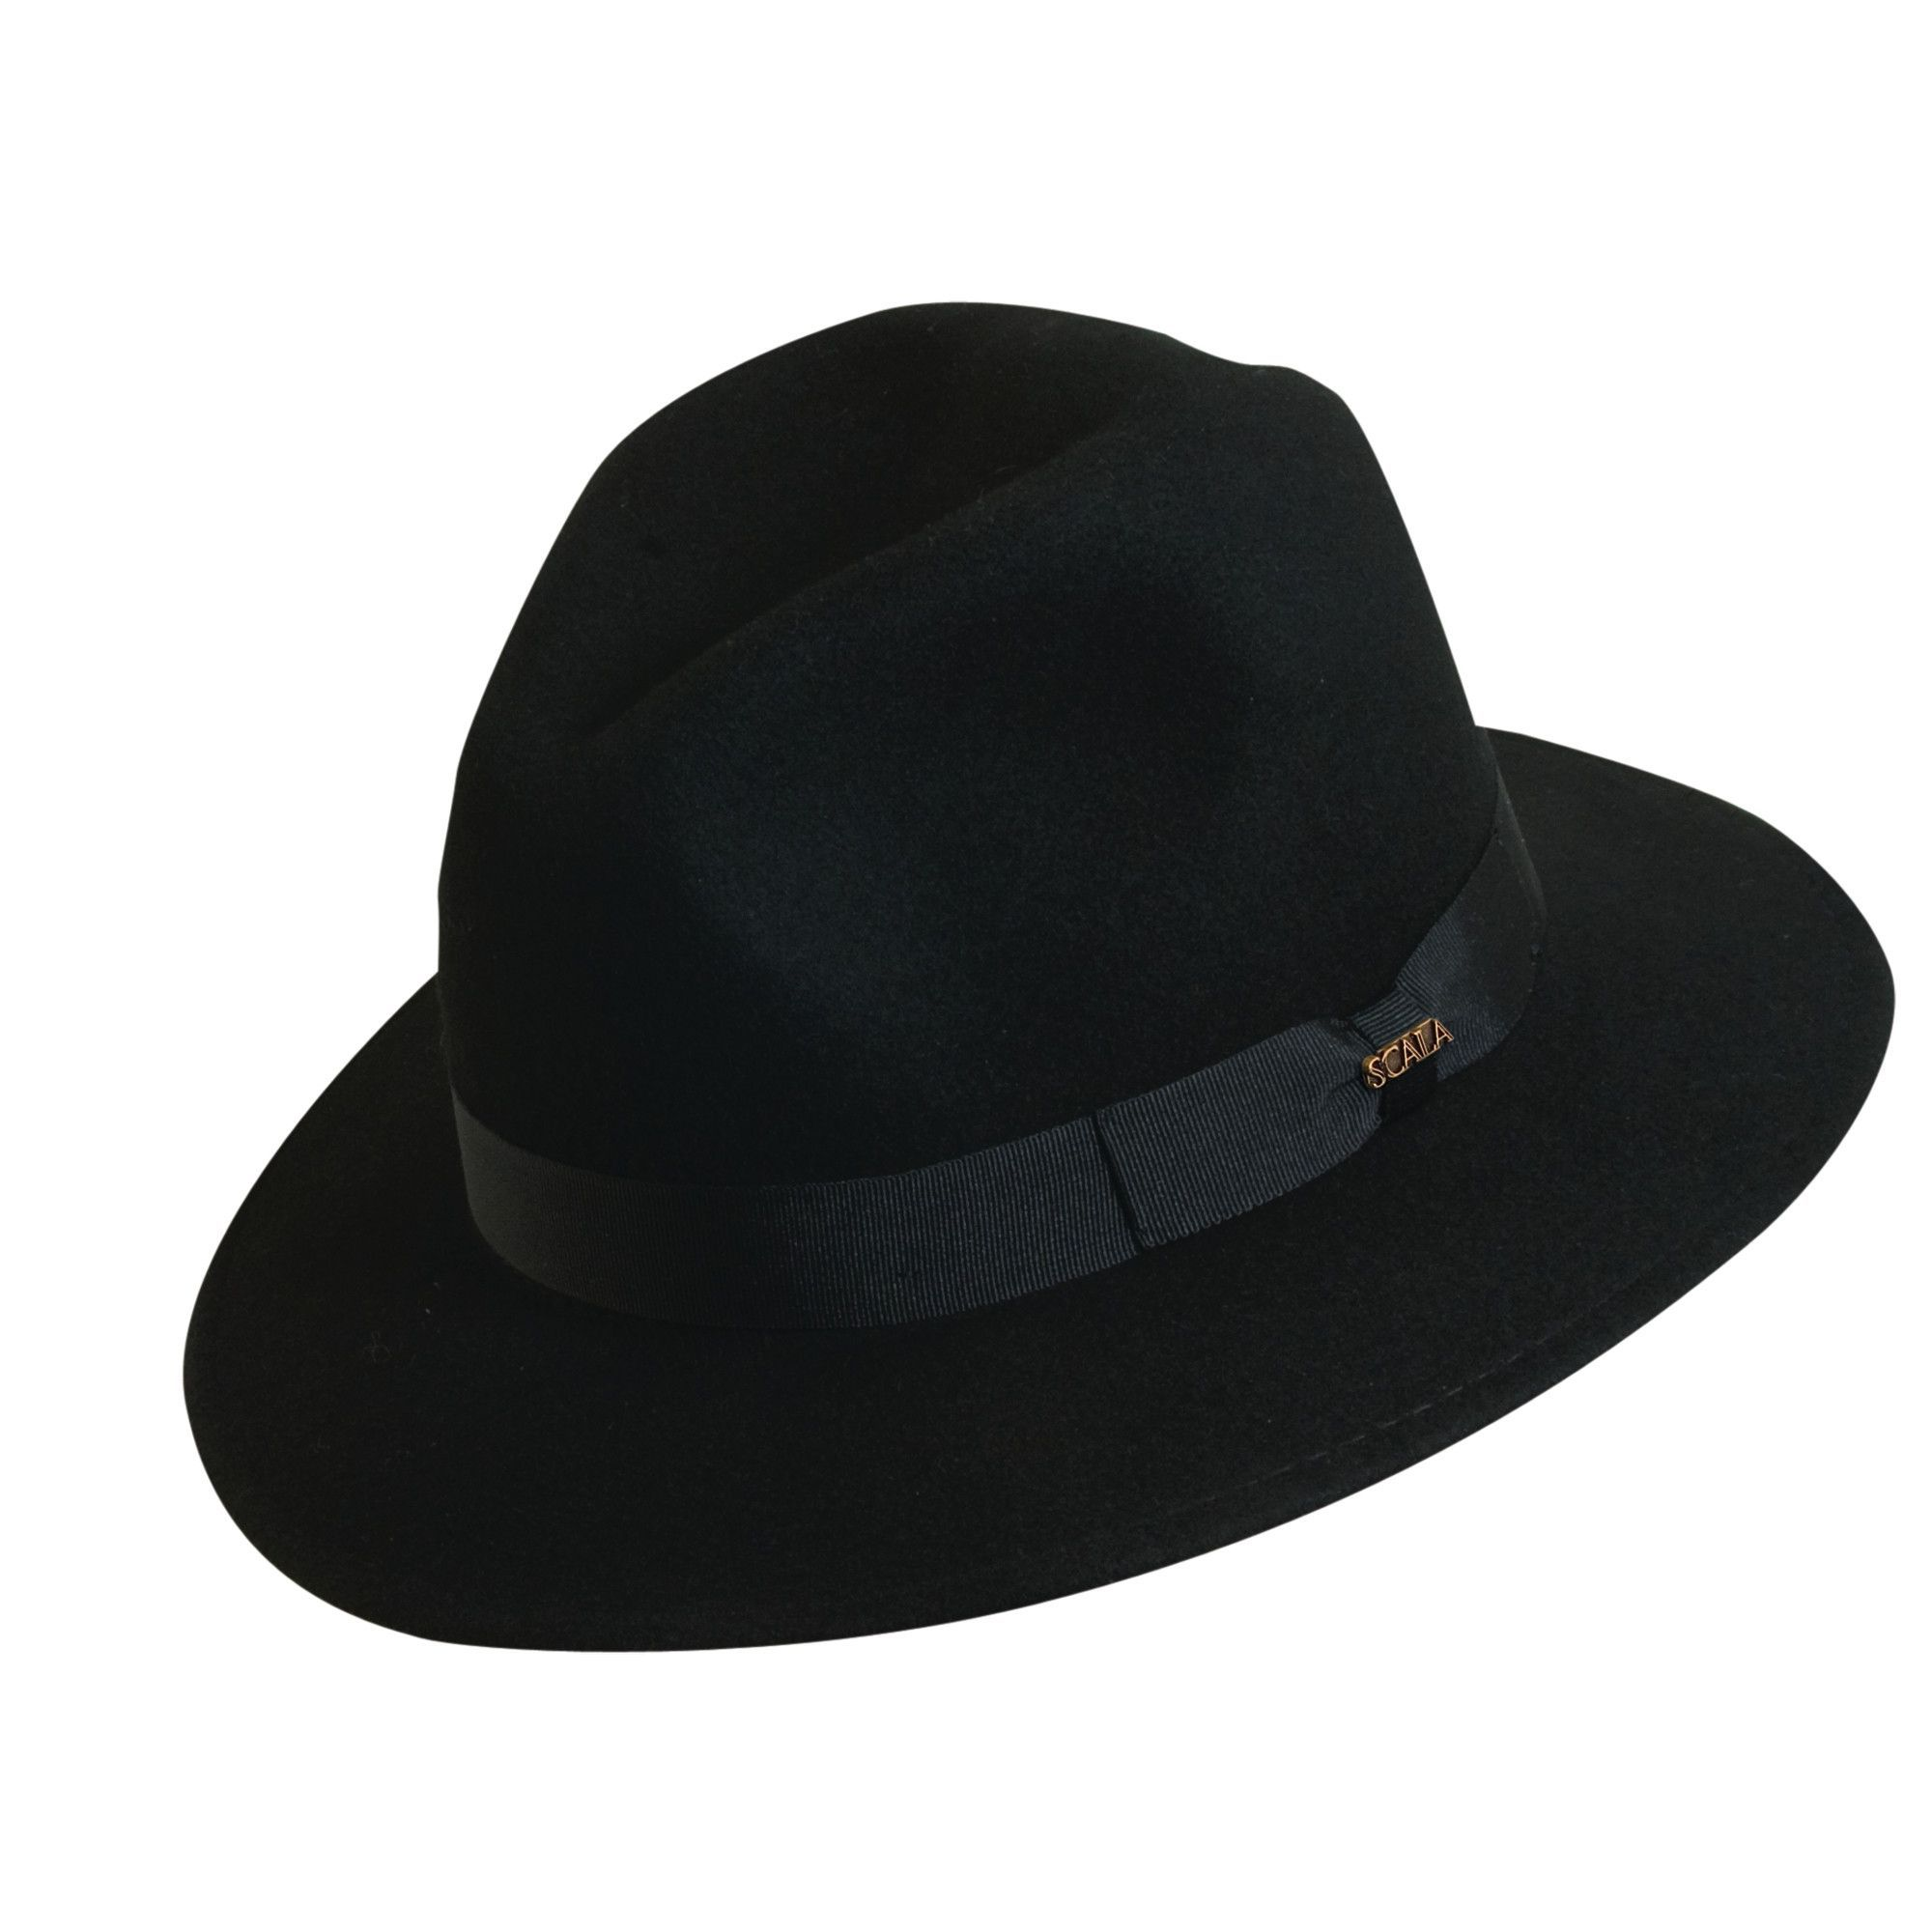 17d0ae6a2c2 Scala Classico Men s 100% Wool Crushable Safari Hat